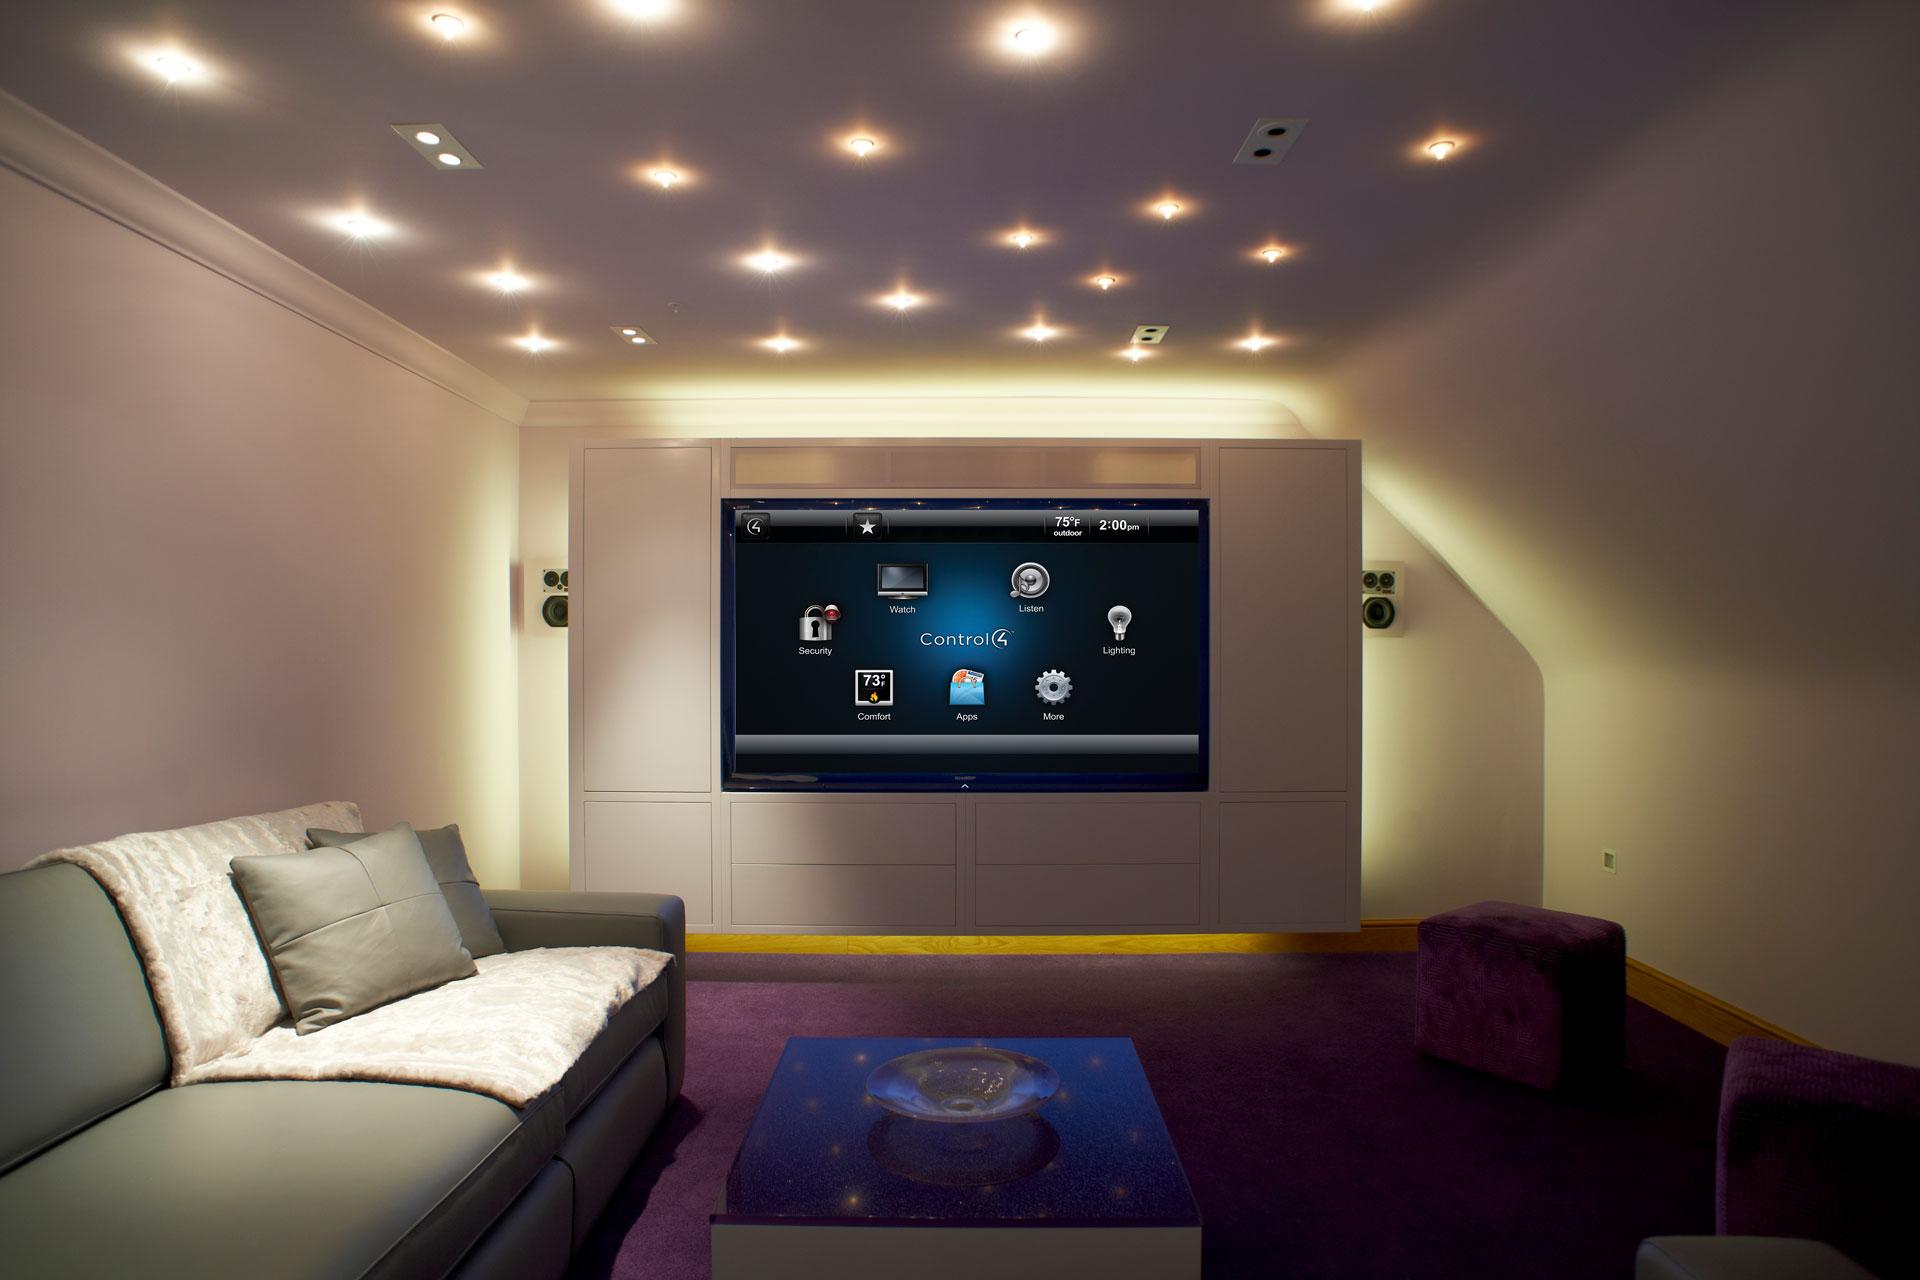 AB-Audio-Visual-Control4-Multi-Room-Video-Lifestyle-1920x1280-Image